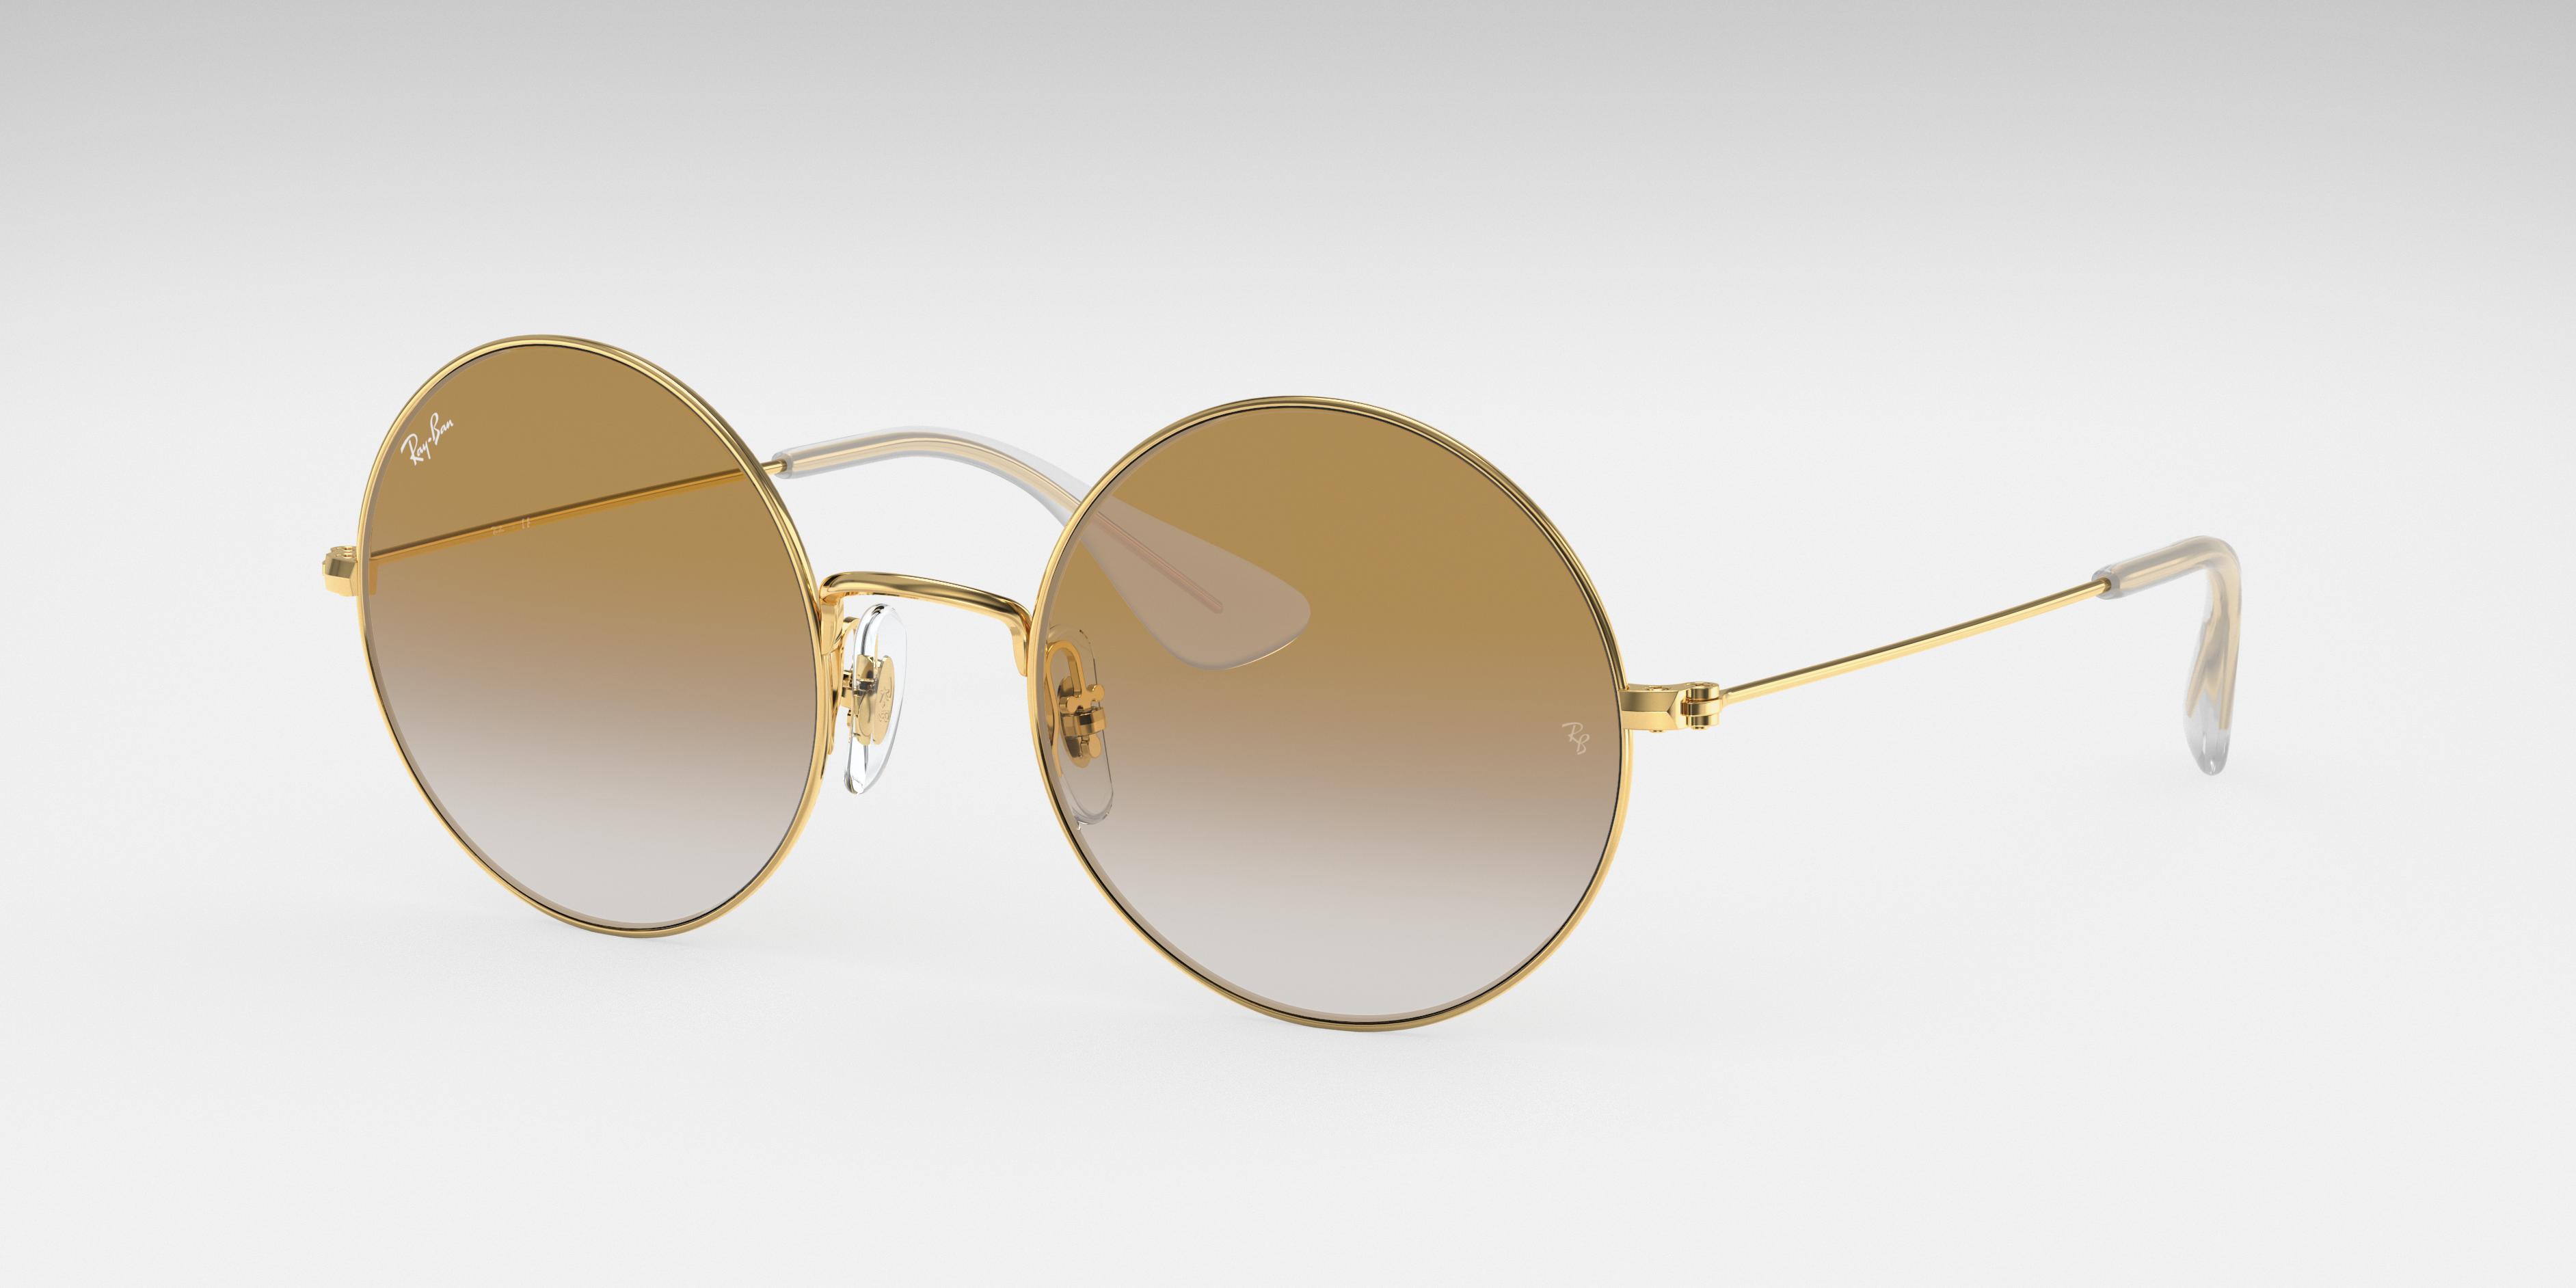 Ray-Ban Ja-jo Gold, Brown Lenses - RB3592